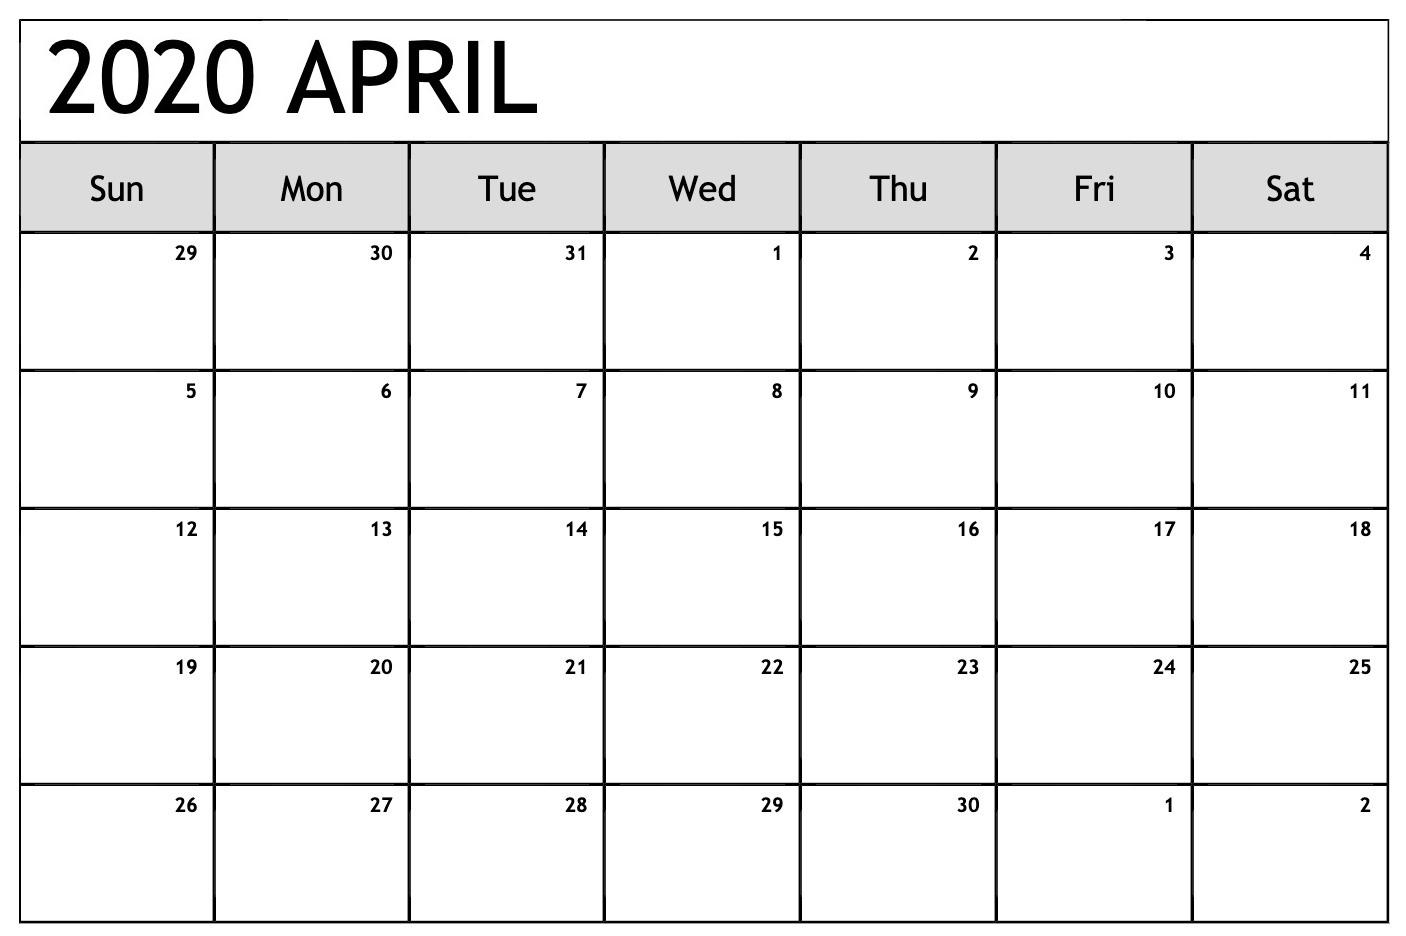 April Calendar 2020 PDF